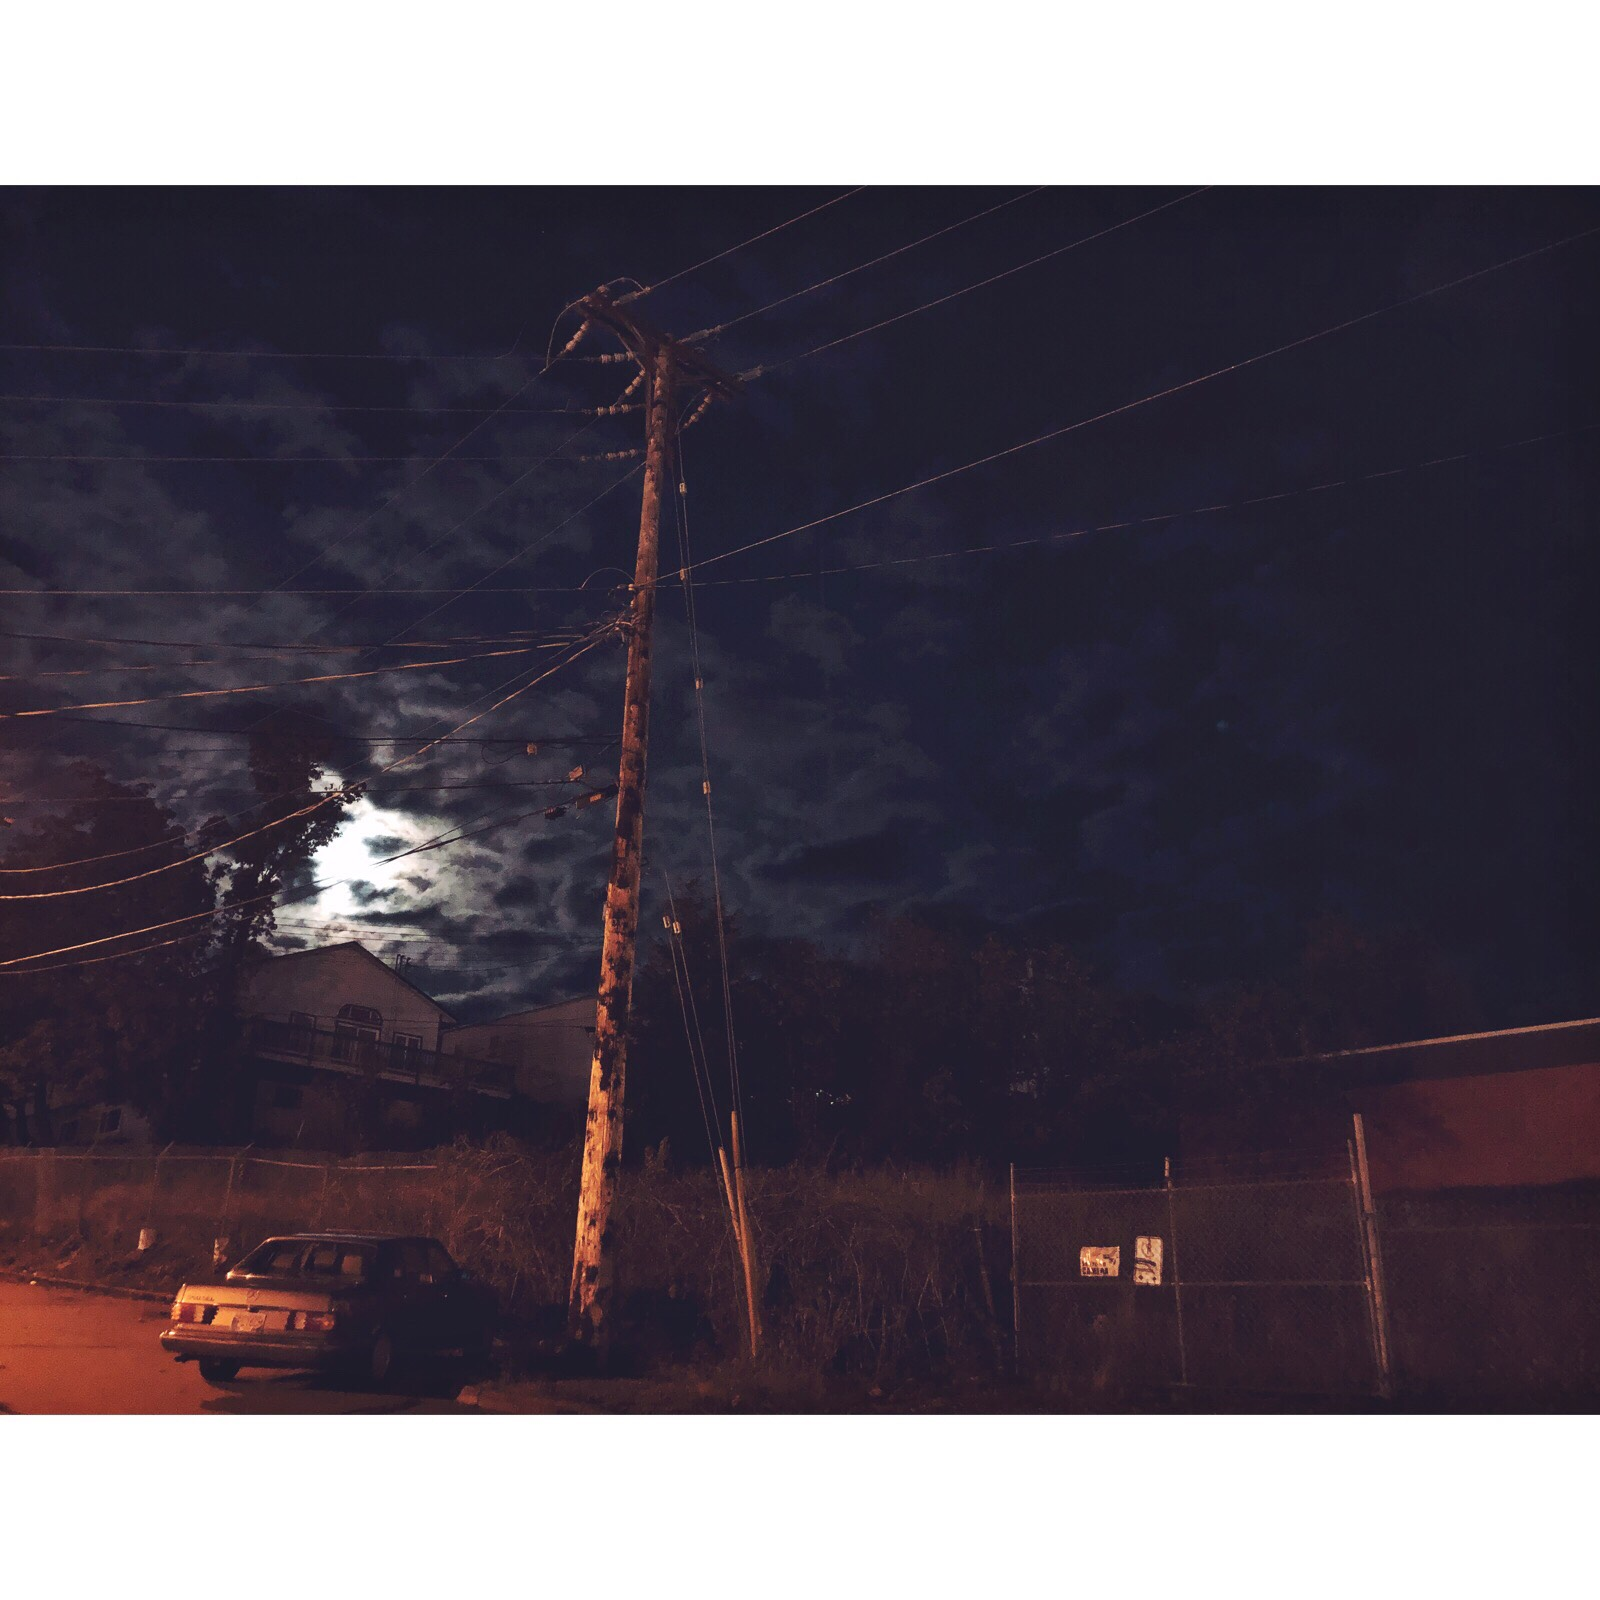 AfterlightImage(24).jpeg